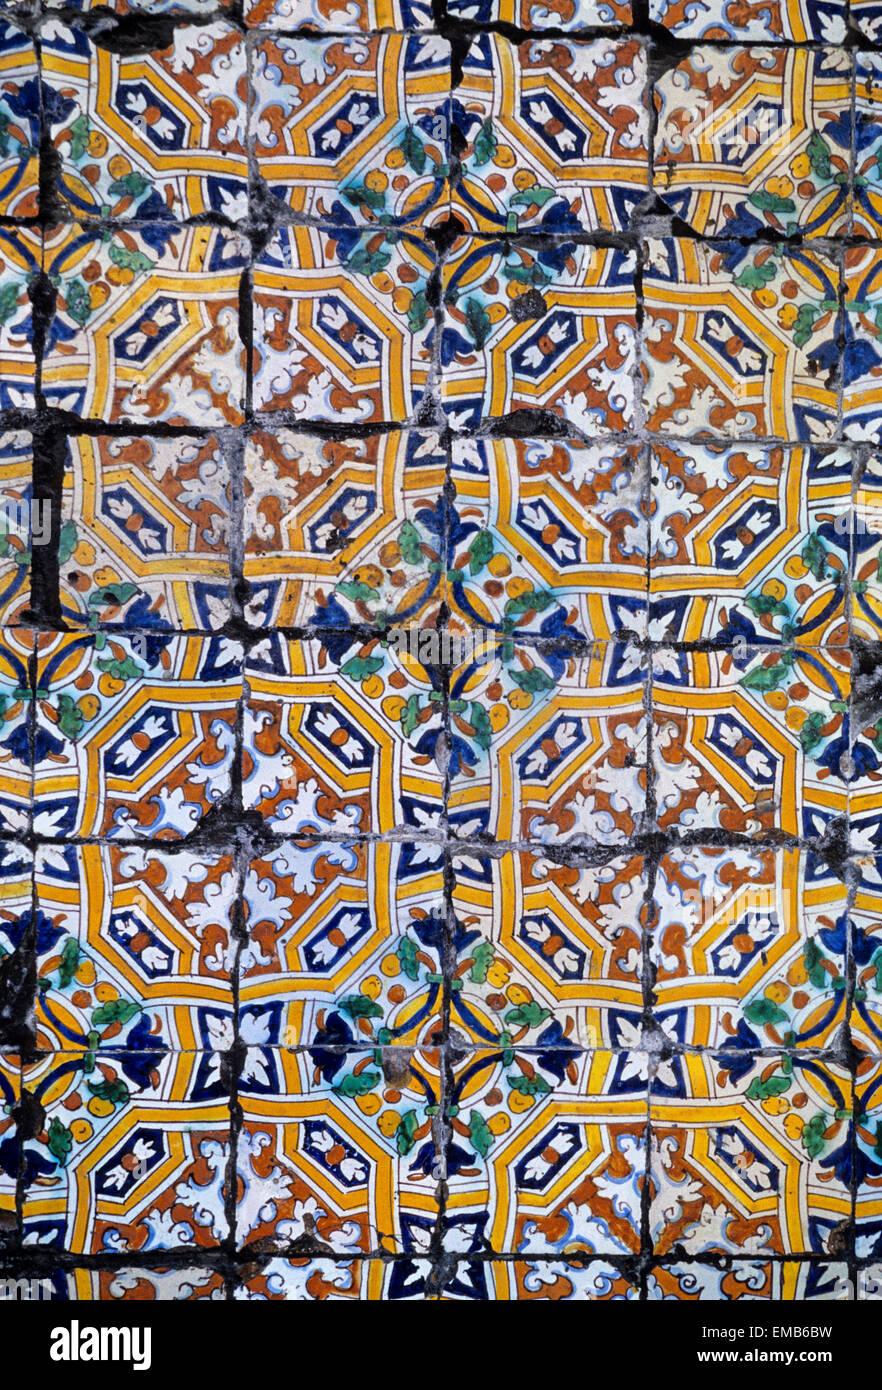 Peru lima 17th century tiles church and convent of santo stock century tiles church and convent of santo domingo shiifo